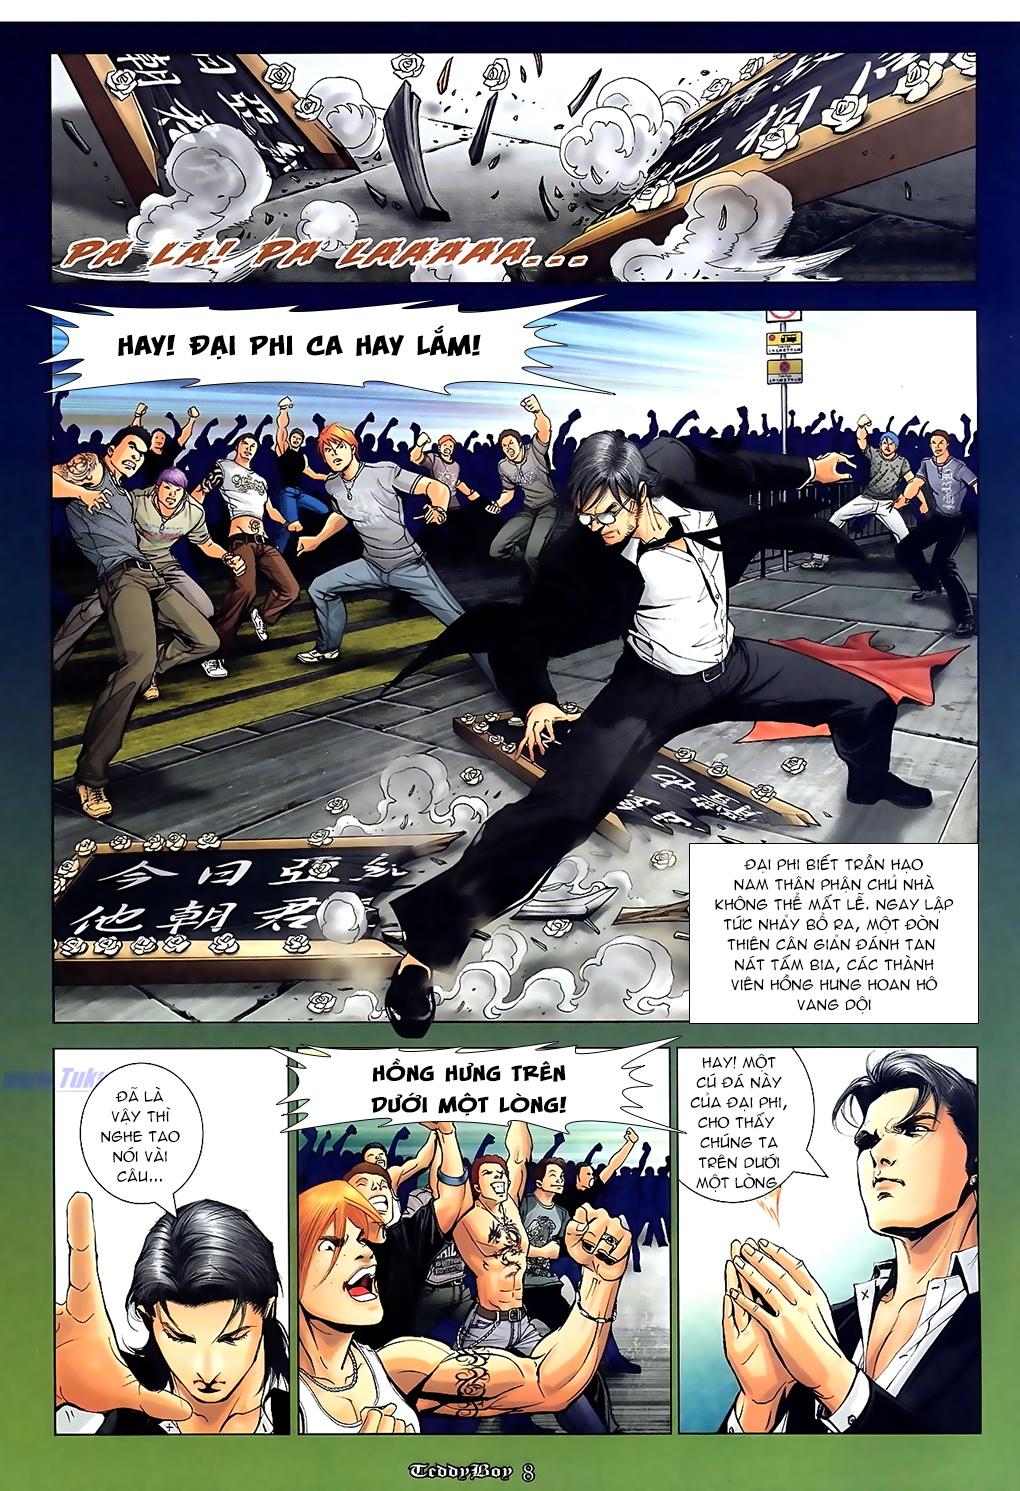 Người Trong Giang Hồ Chap 1018 - Truyen.Chap.VN